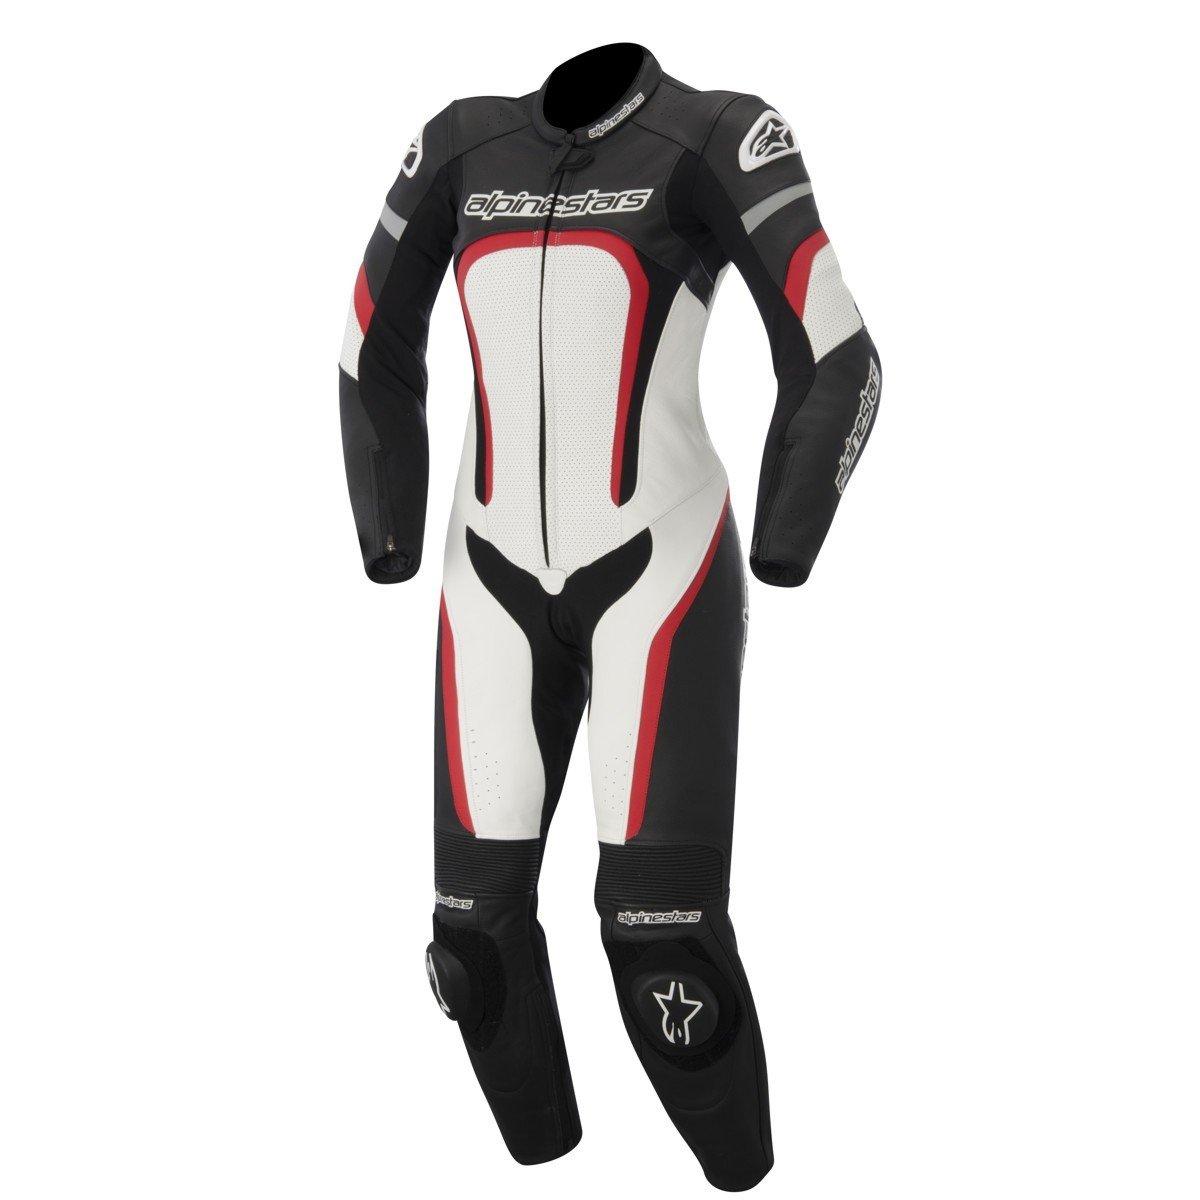 Alpinestars Stella Motegi 1PC Suit Black/White/Red 38